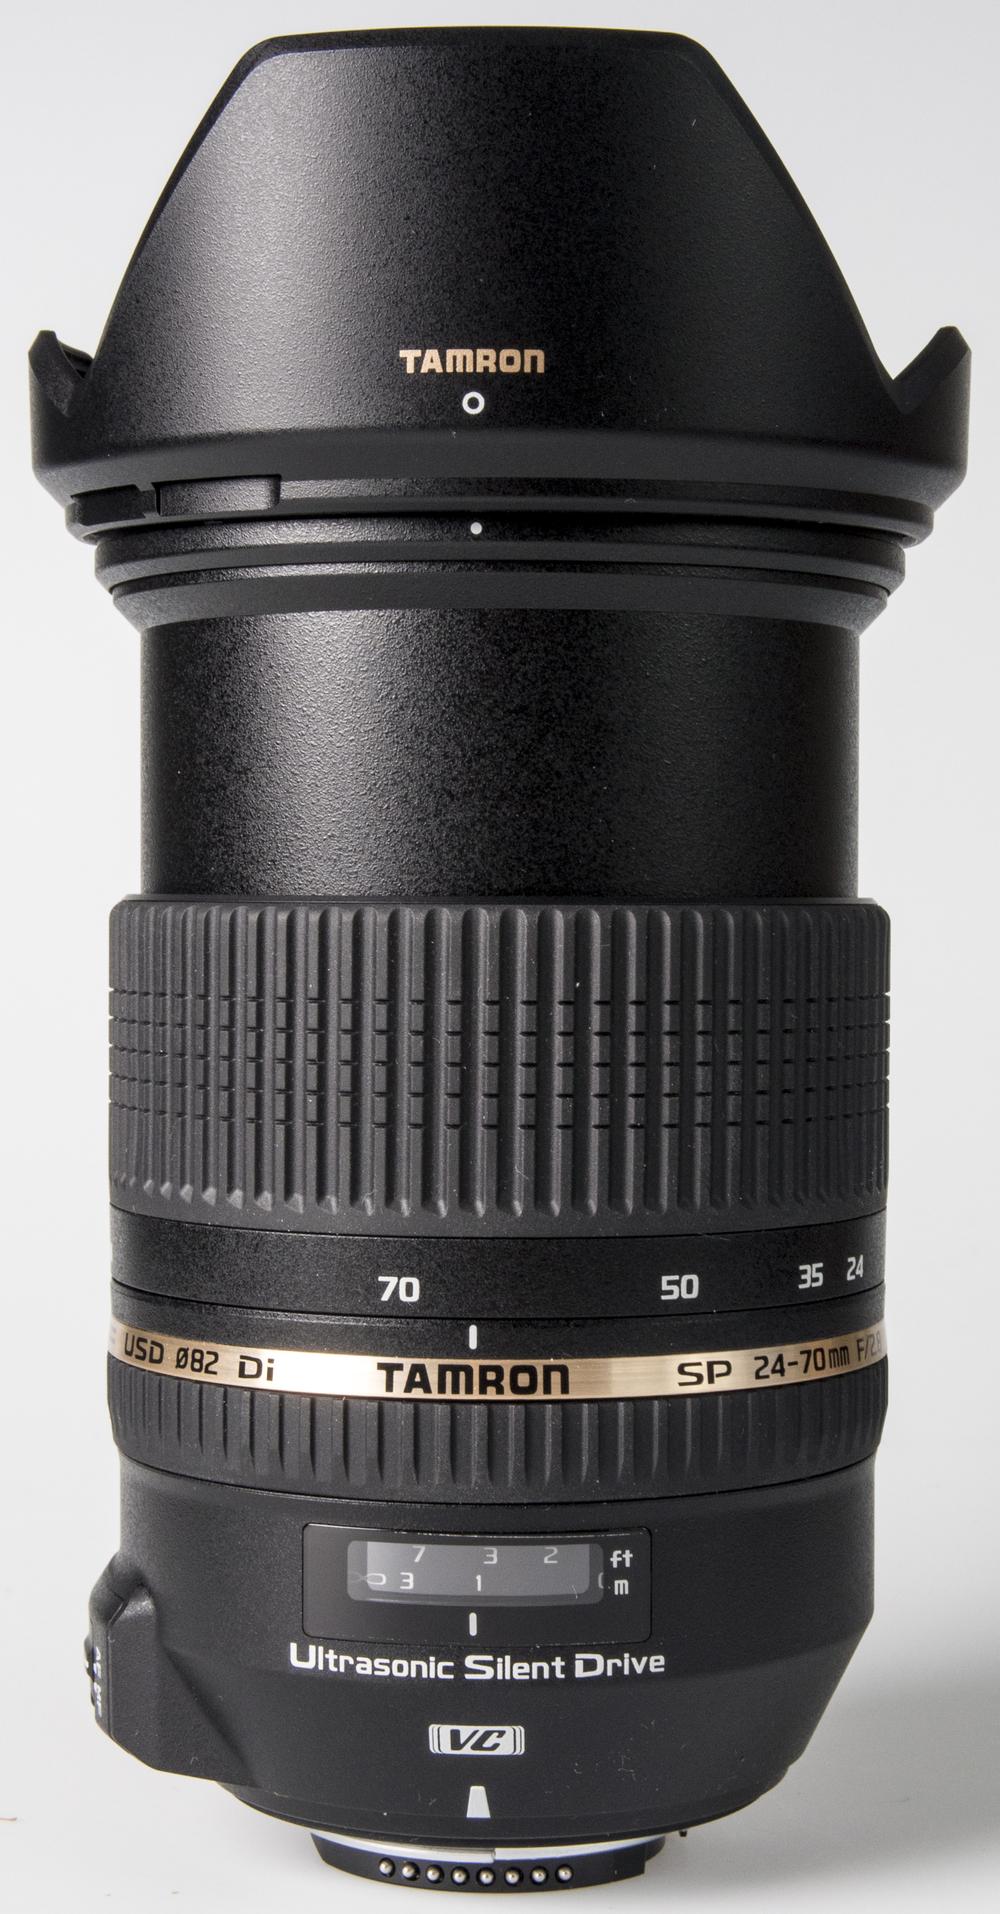 highres-tamron-24-70-lens_1352808747.jpg